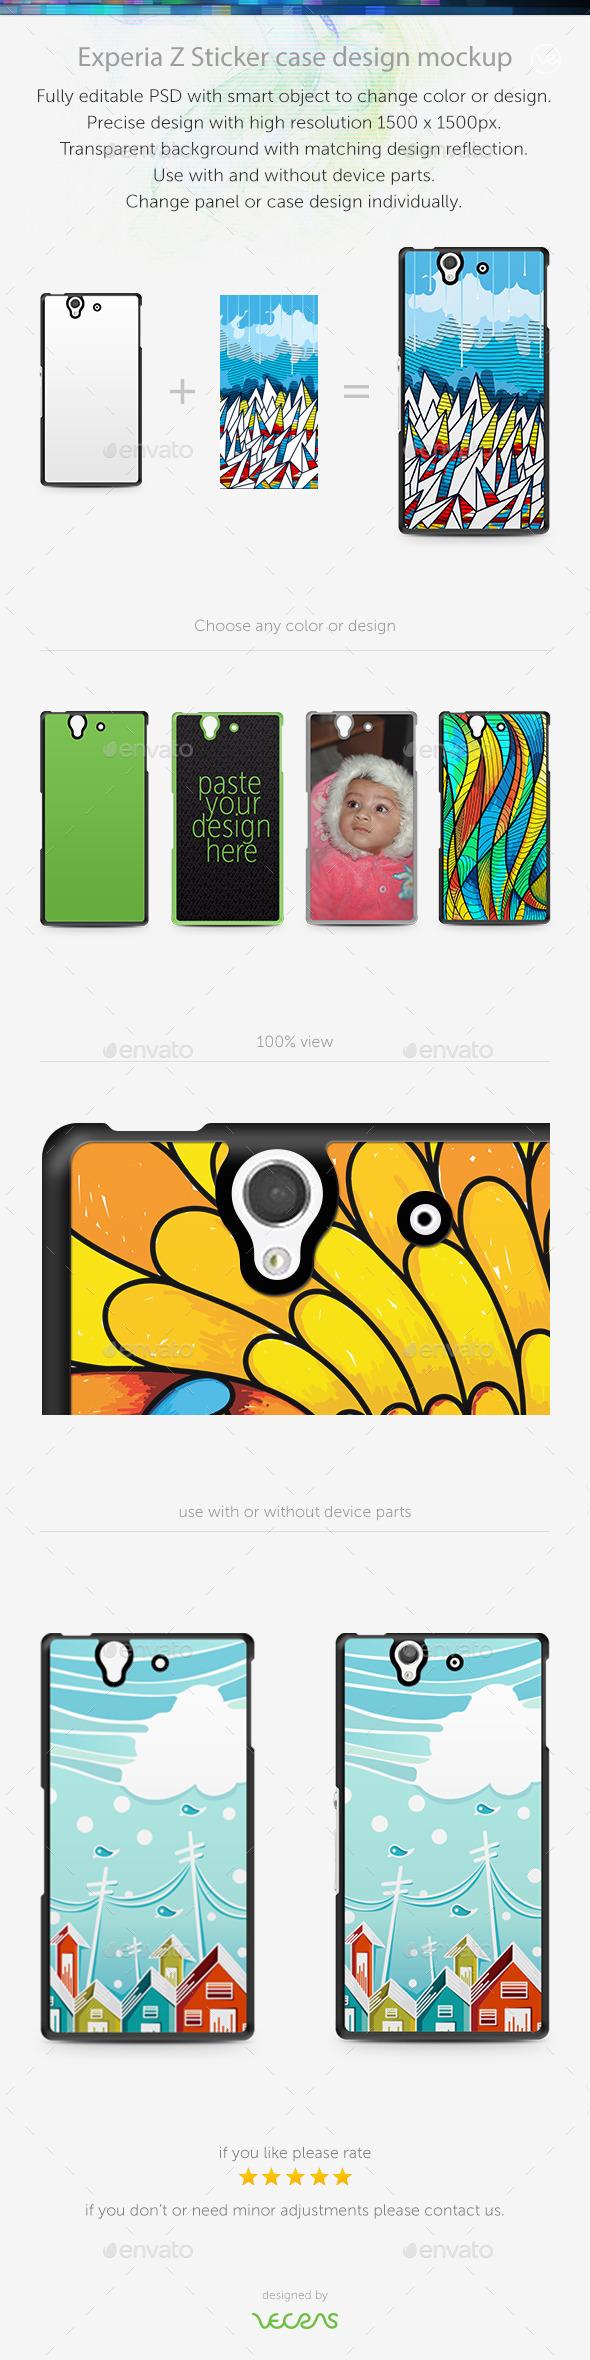 Experia Z Sticker Case Design Mockup